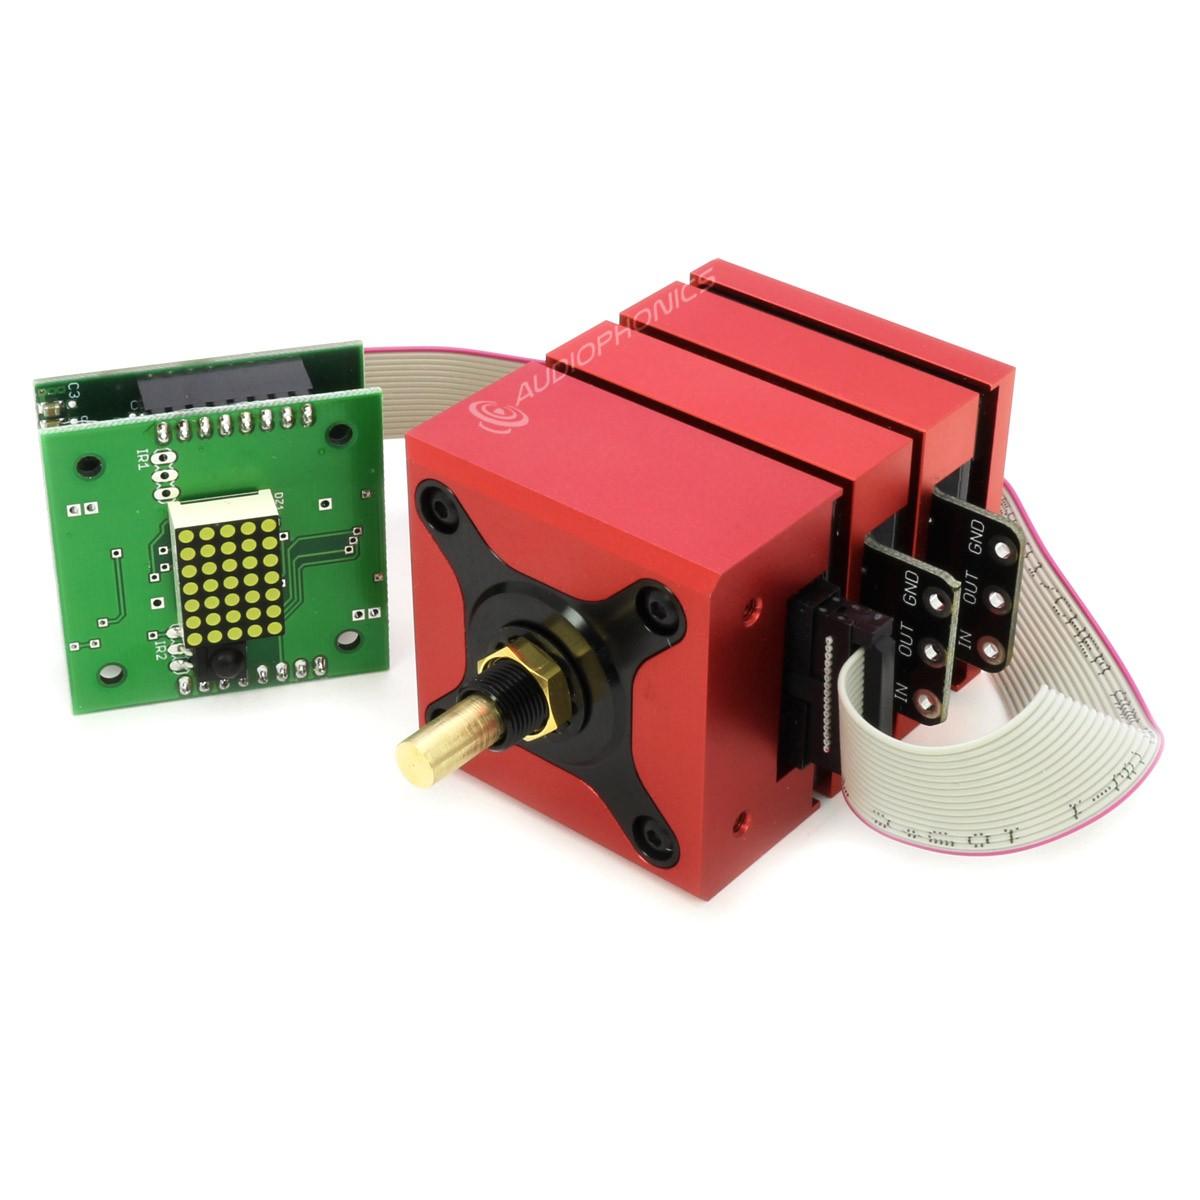 KHOZMO ACOUSTIC Relay Volume Attenuator 10k 64 Steps MBB Switching Vishay Stereo